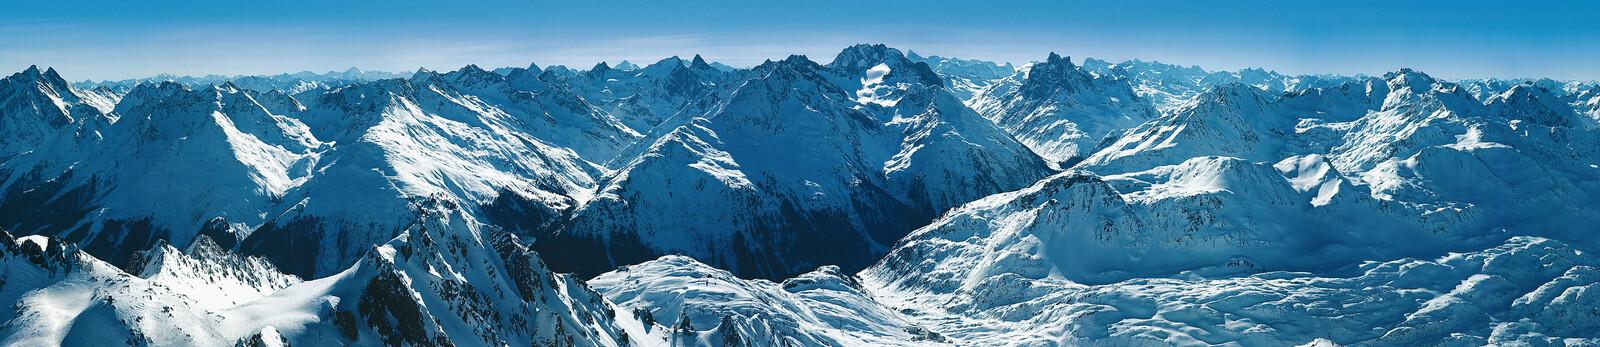 Lechtaler Alpen - Rudolf Rother